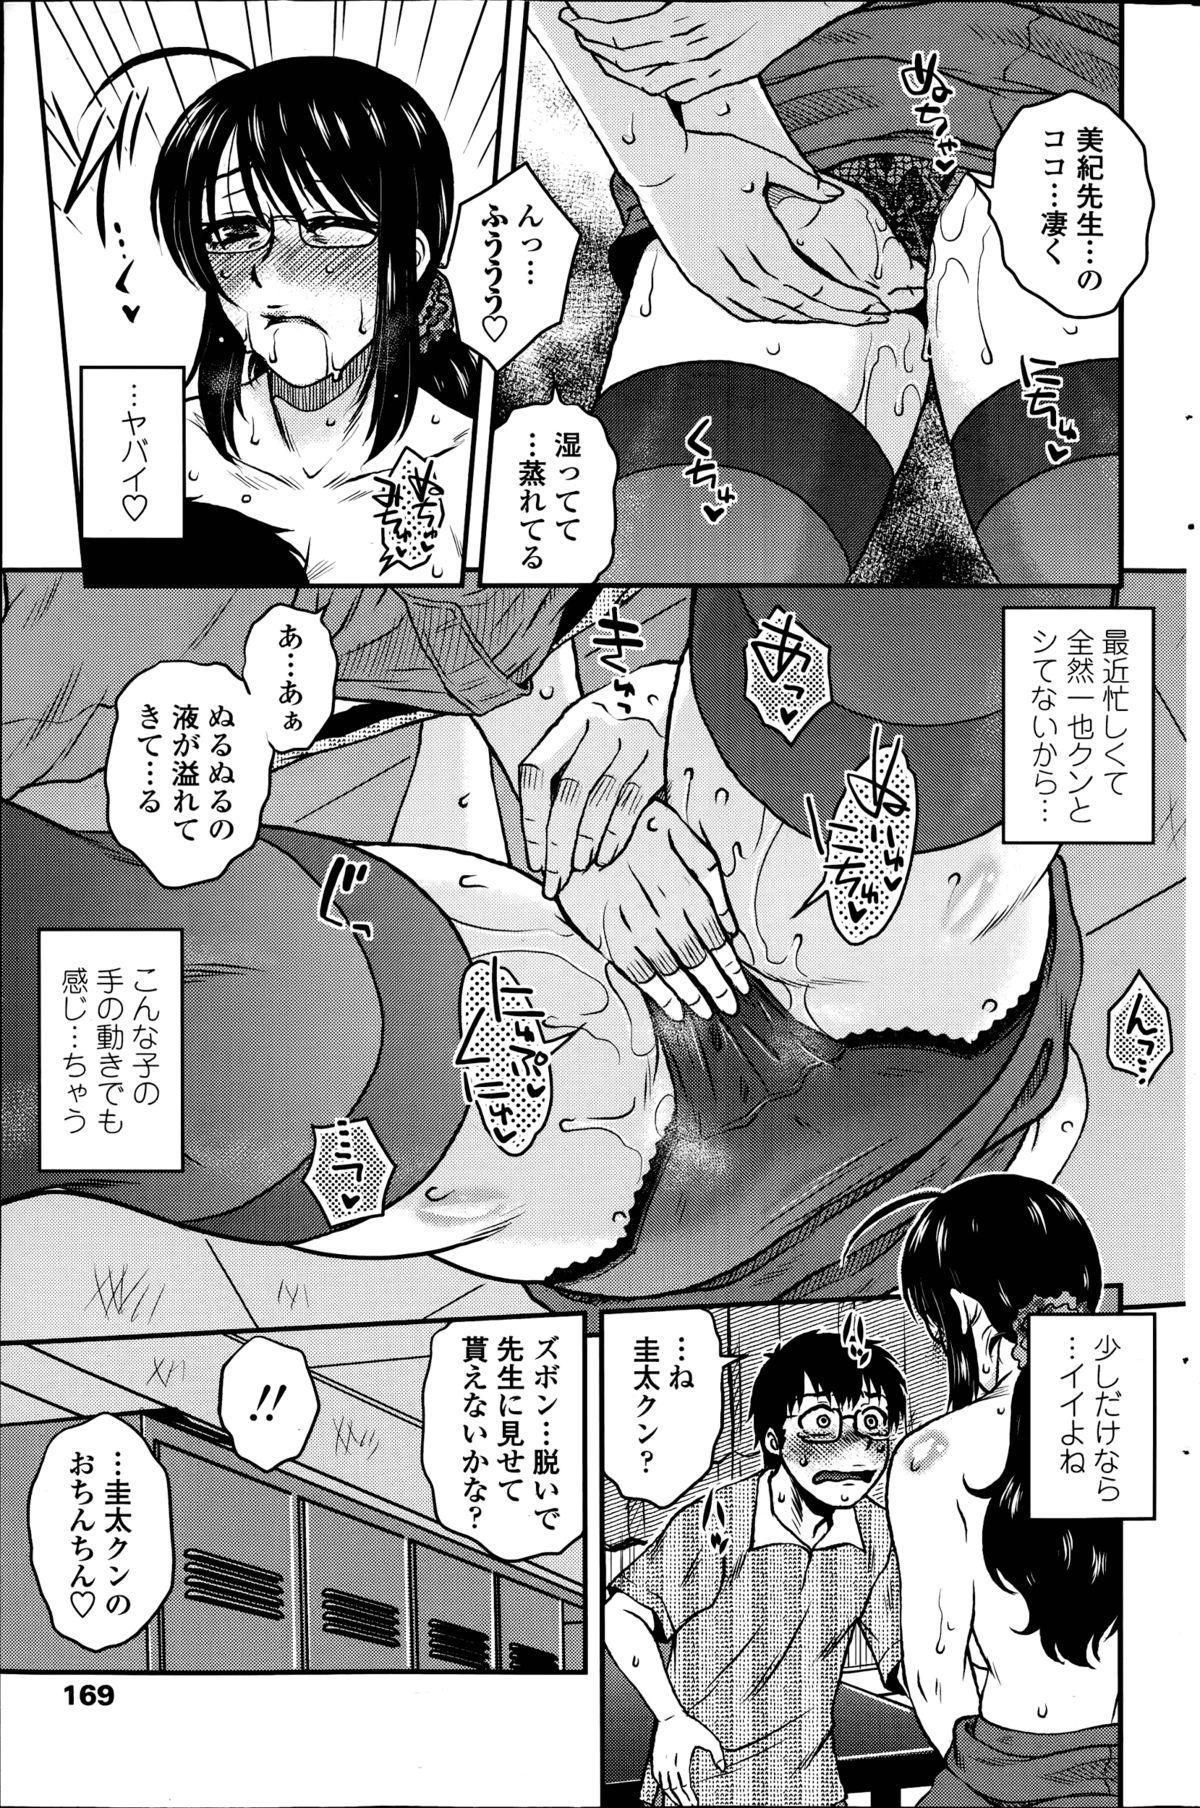 [Kurumiya Mashimin] Mikkai-chuu ni Tsuki Ch.1-6 48